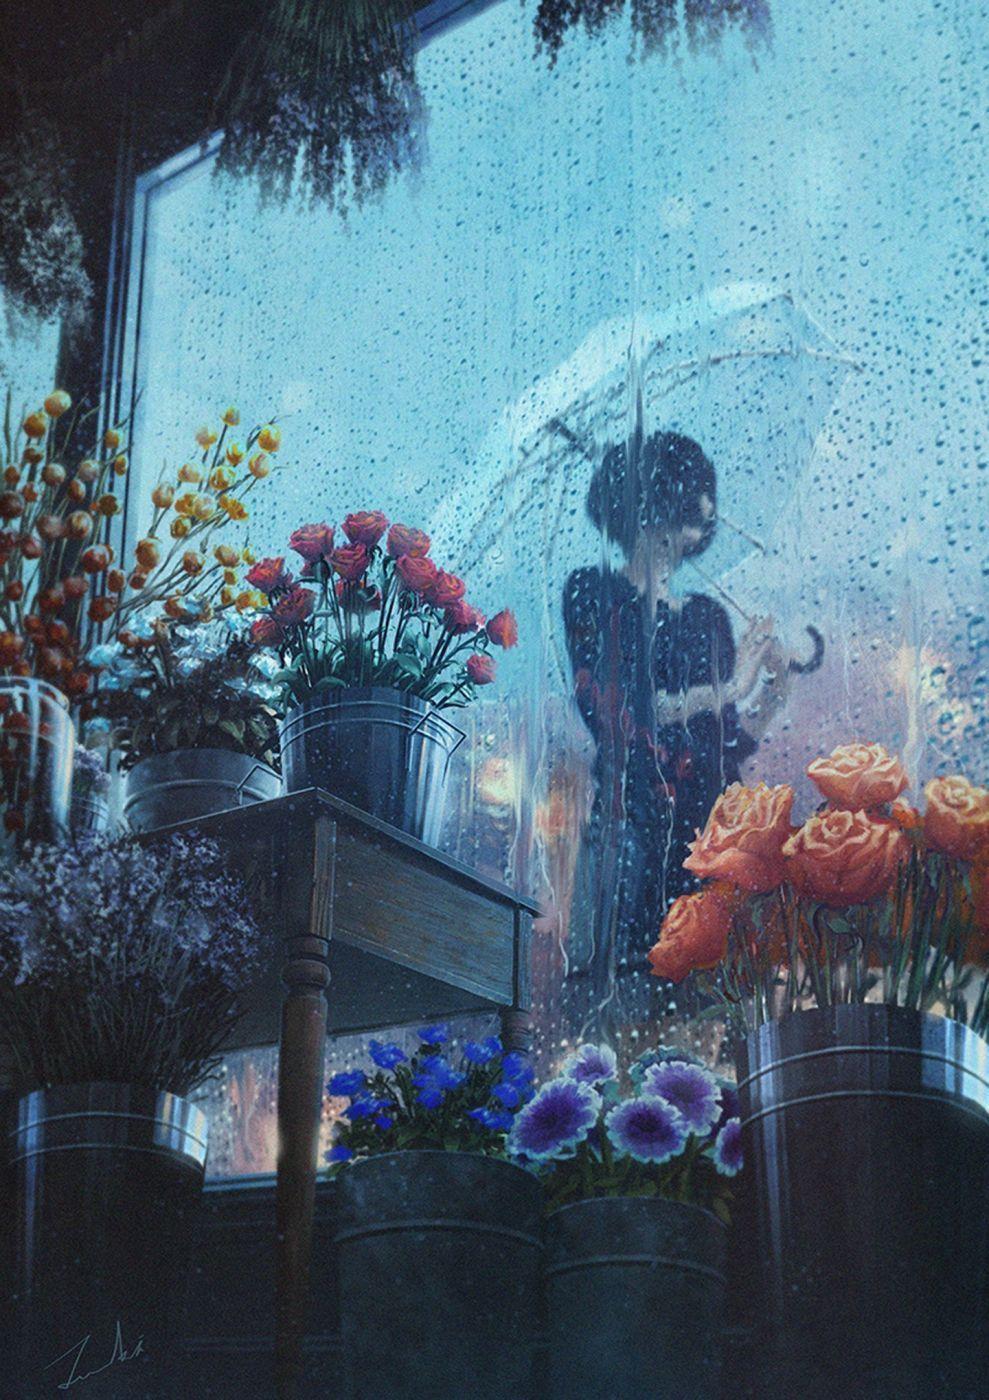 Umbrella And Rain Anime Wallpapers Wallpaper Cave Illyustracii Art Fentezi Risunki Risunki